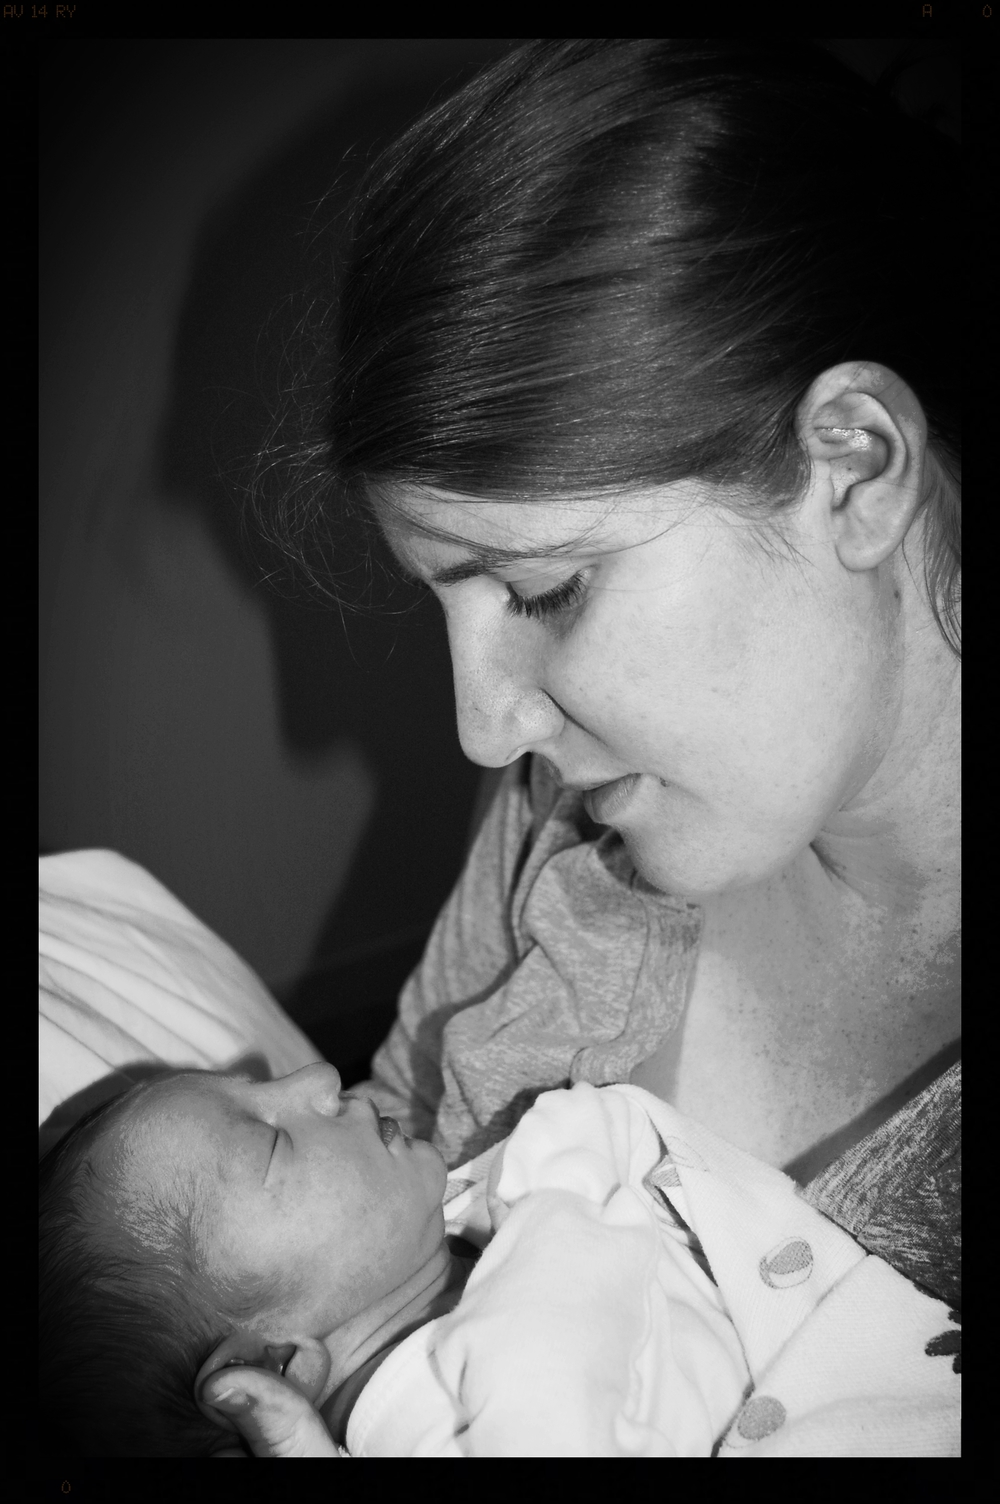 postpartum doula-motherline-postpartum support-doula support